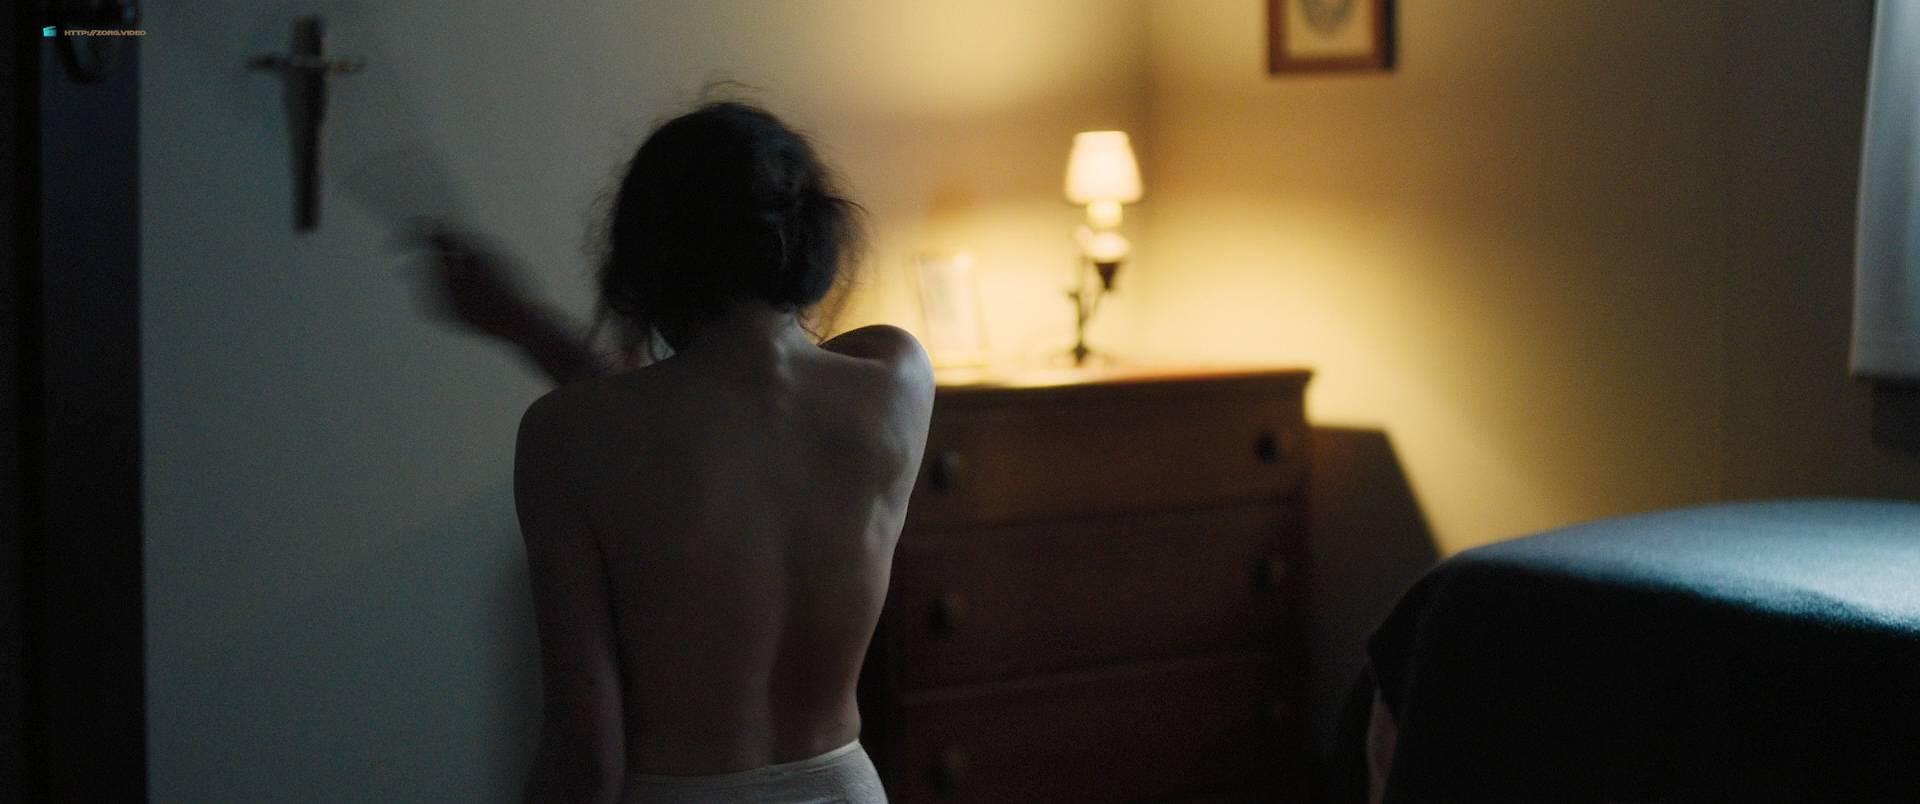 Margaret Qualley nude topless if her in brief scene - Novitiate (2017) HD 1080p BluRay (7)